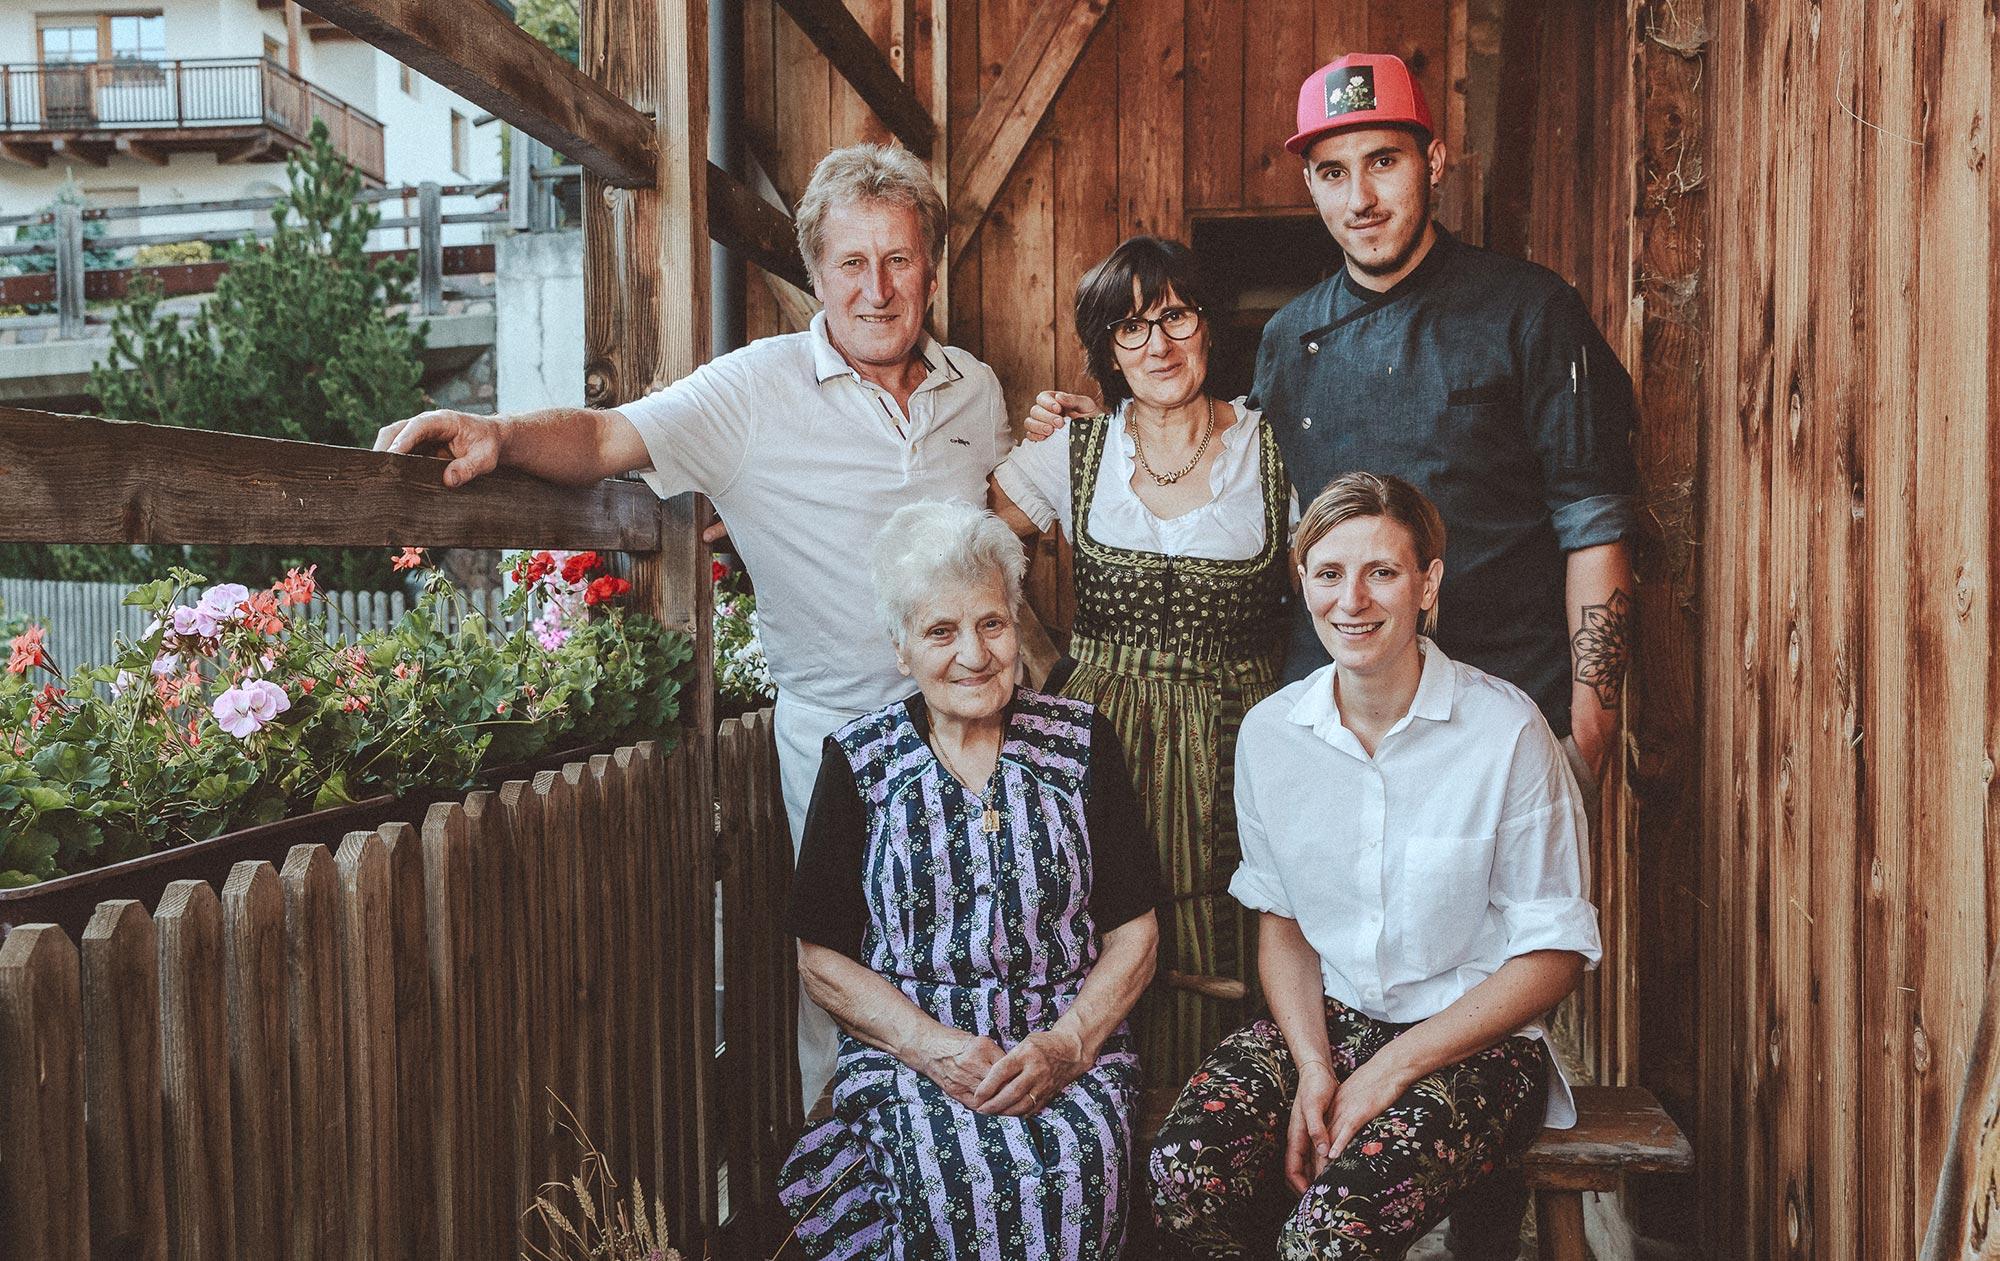 Die Familie Pitschieler vom Mea Via